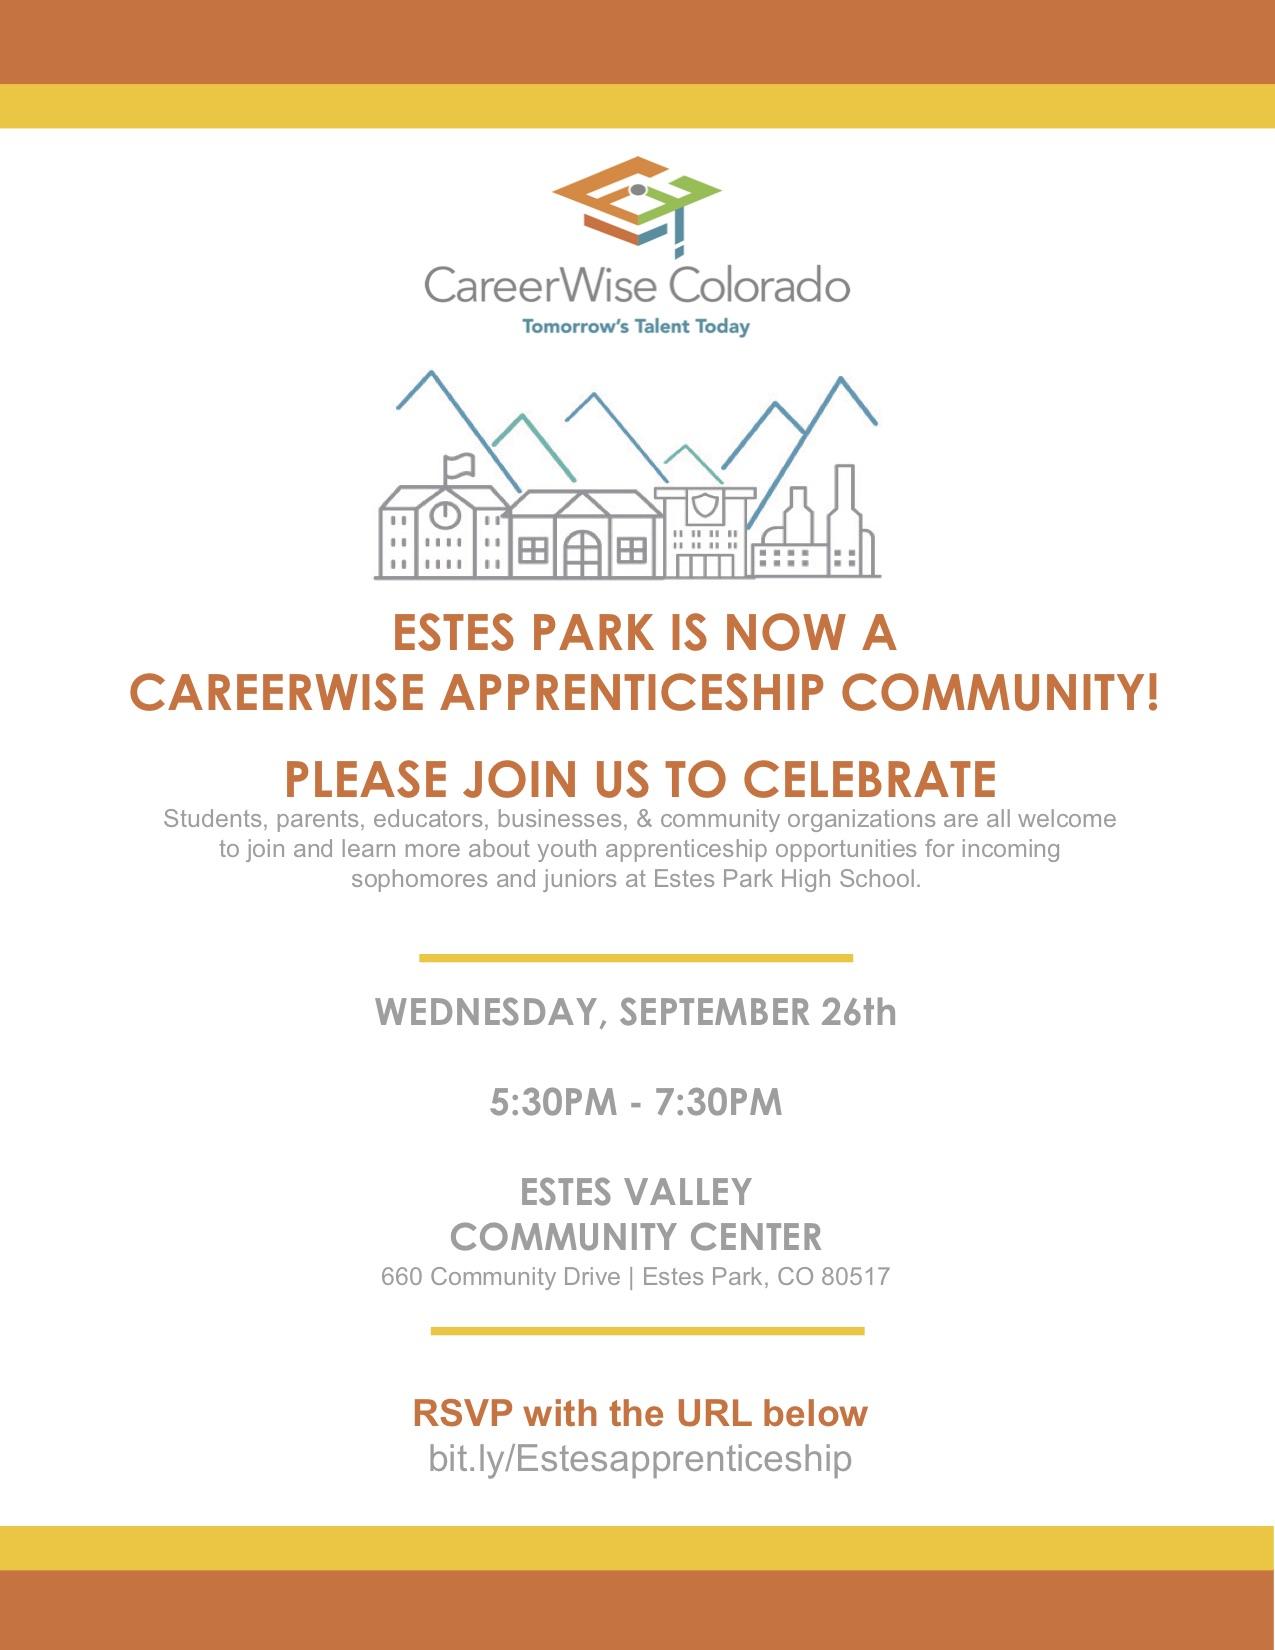 Estes-Park-Apprenticeship-Careerwise-Celebrations.jpg